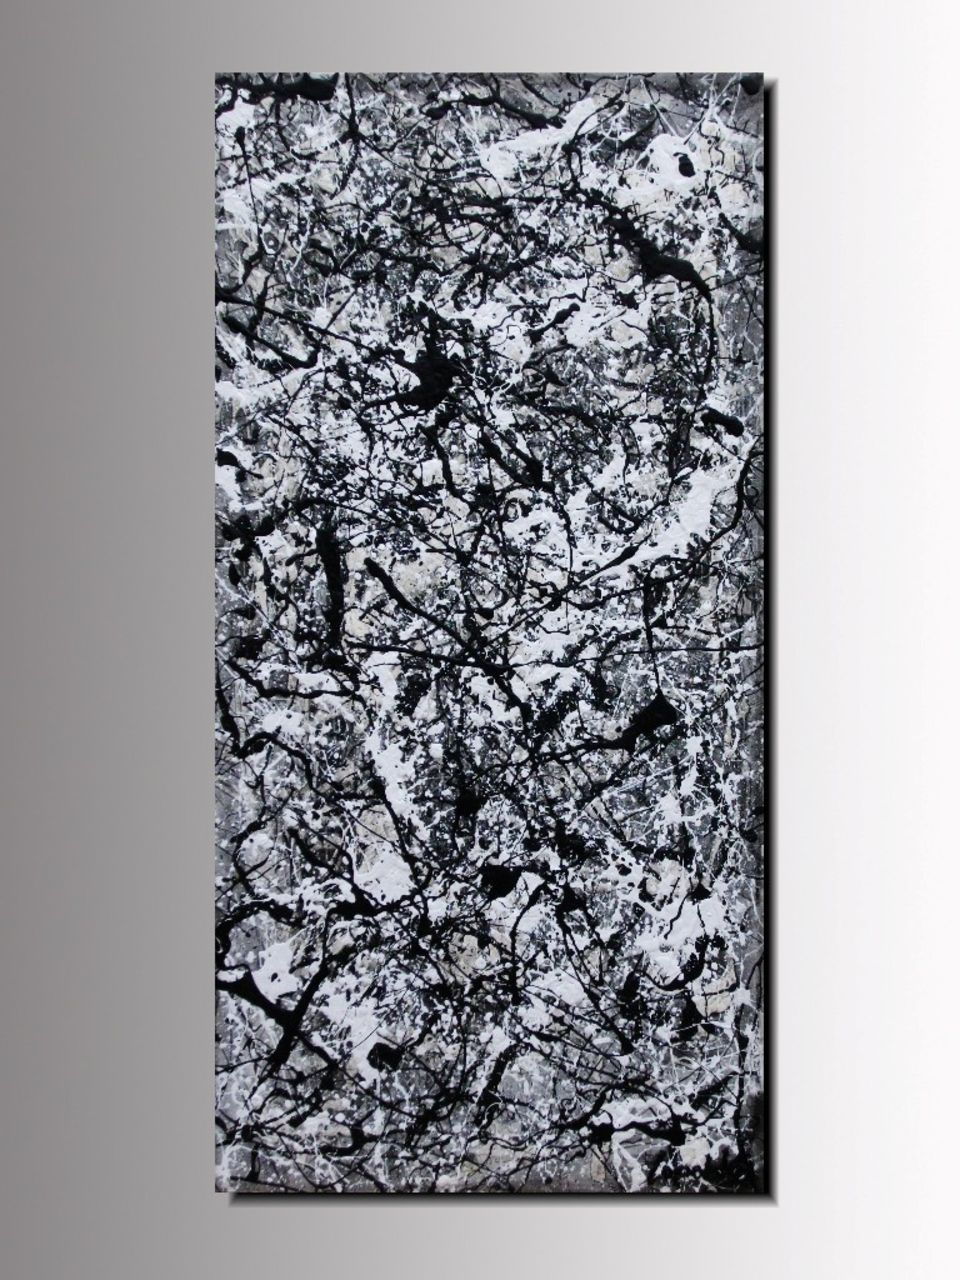 MK  Lepolsk Matuszewski  PLATINUM expressionnisme abstrait contemporain Lepolsk Matuszewski 2011 artiste peintre plasticien - Copie